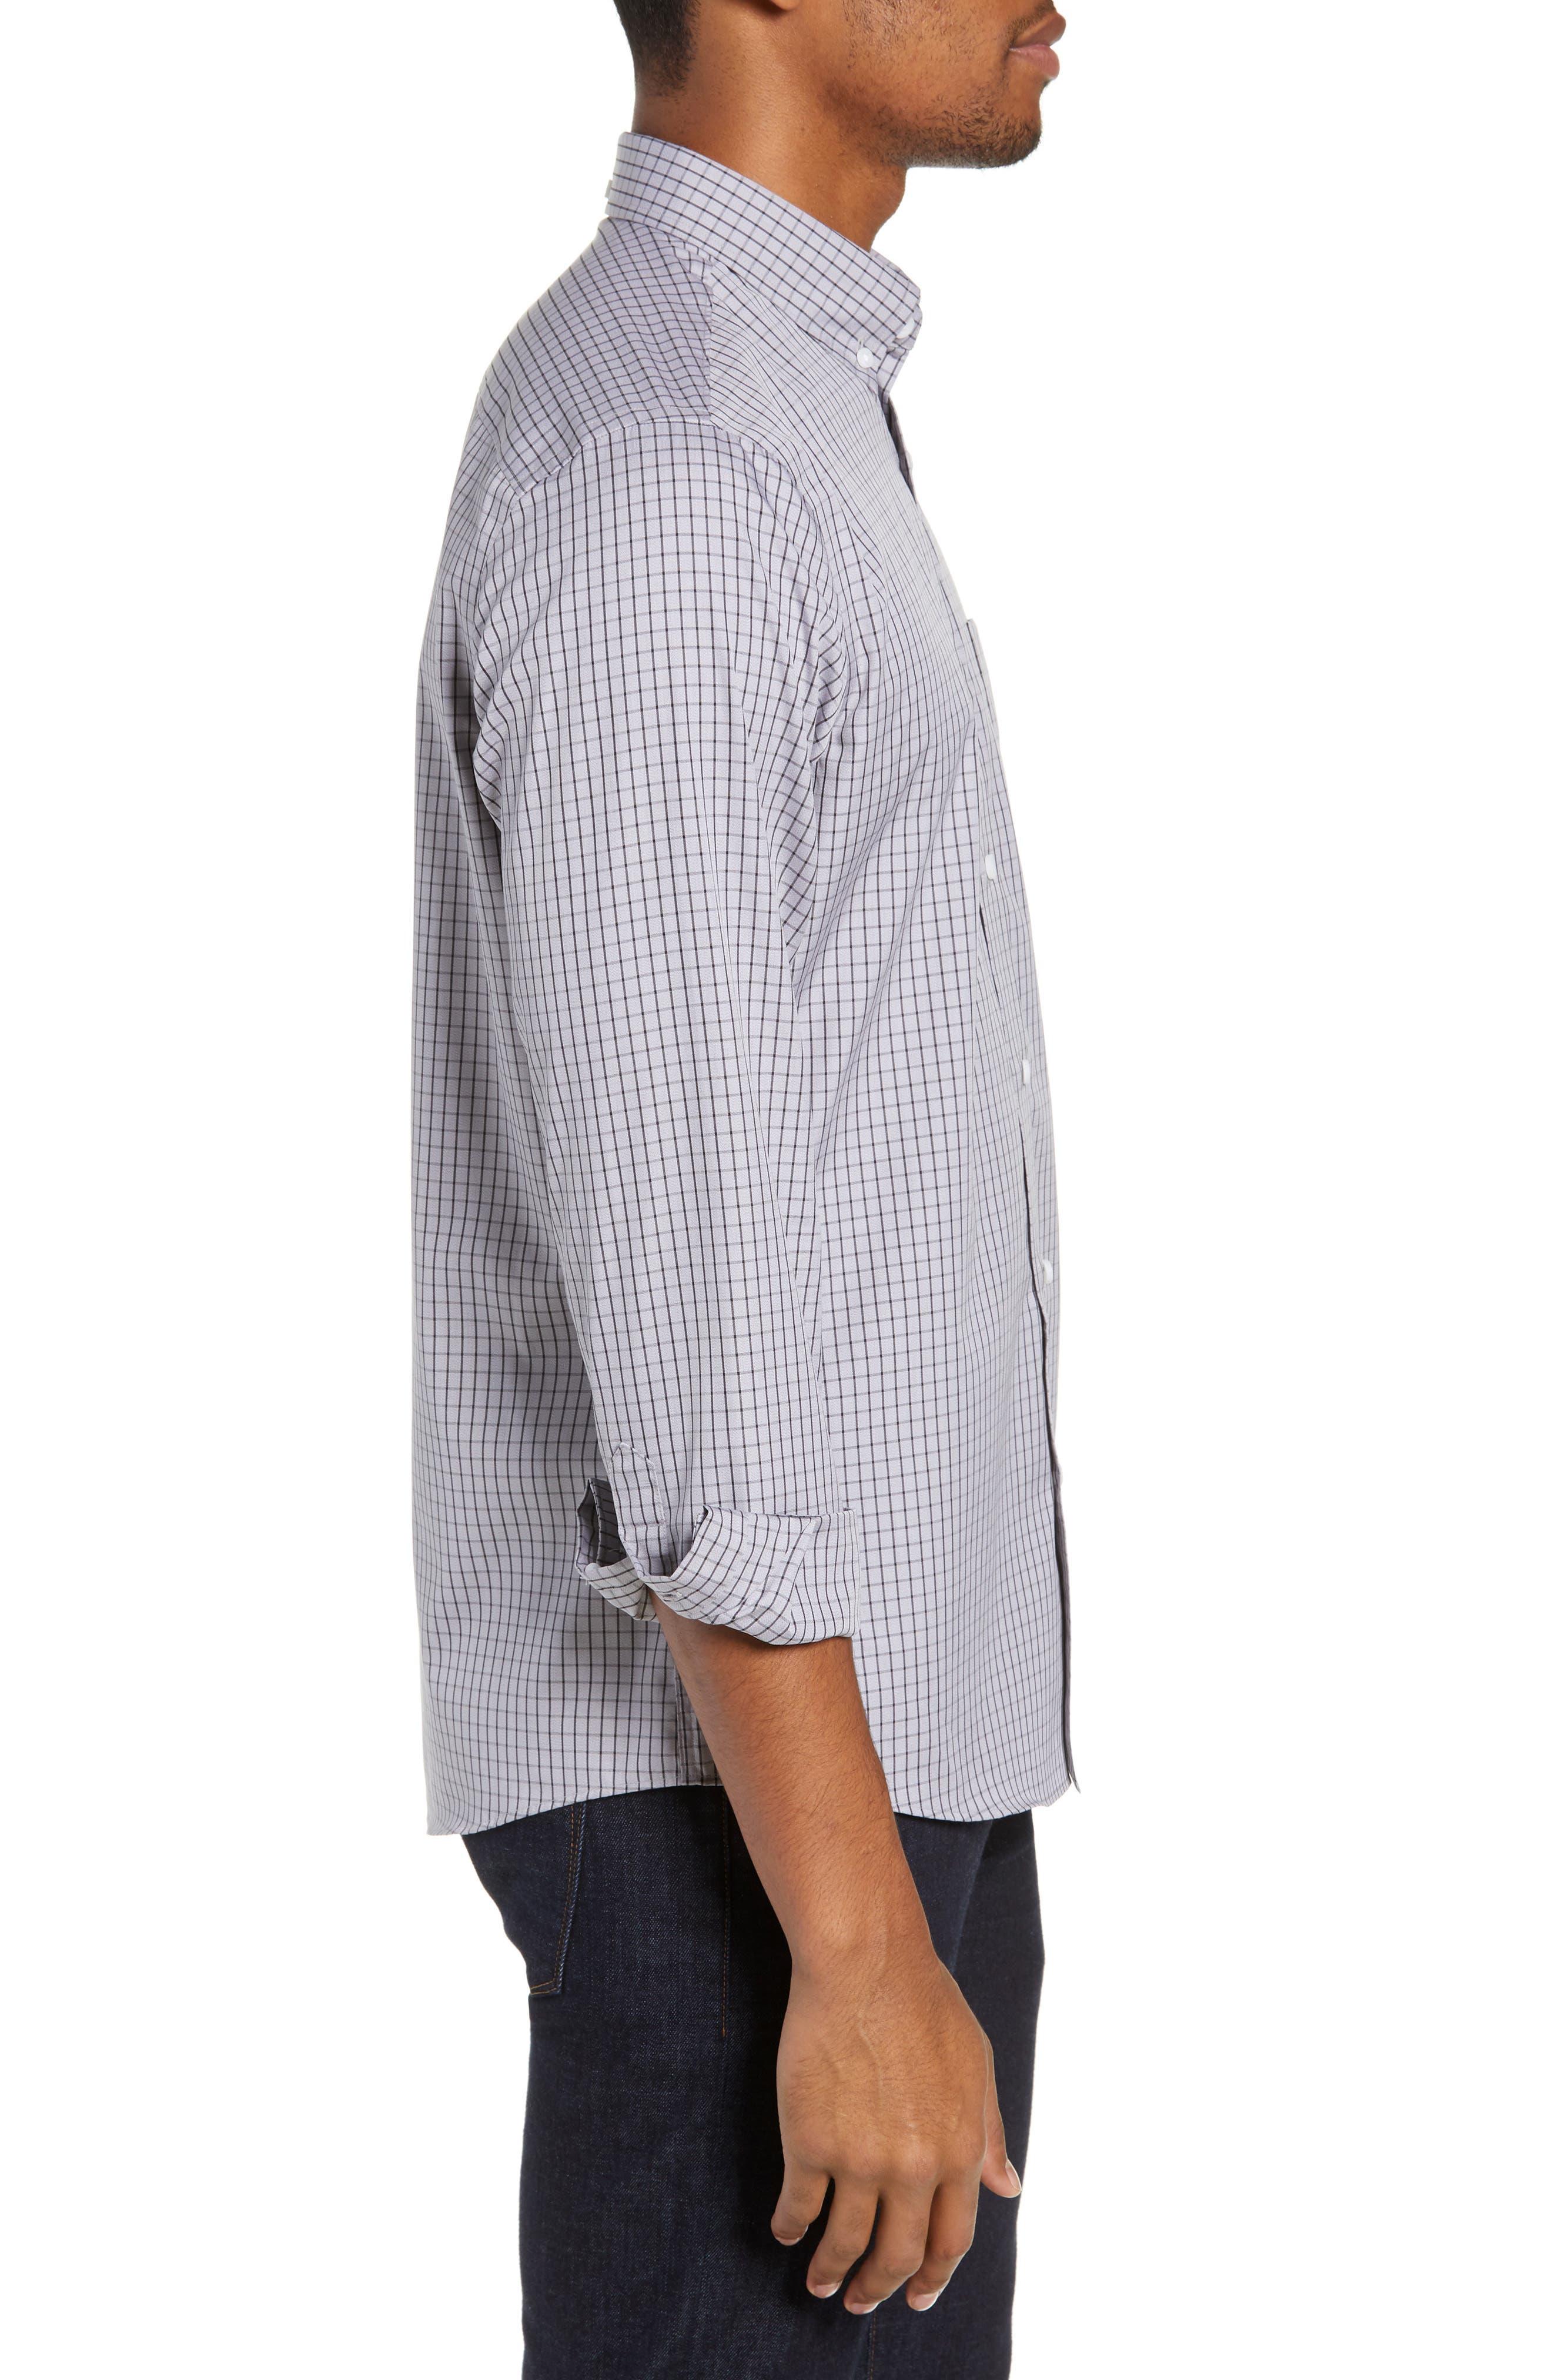 NORDSTROM MEN'S SHOP,                             Trim Fit Non-Iron Check Sport Shirt,                             Alternate thumbnail 4, color,                             GREY FILIGREE MINIGRID